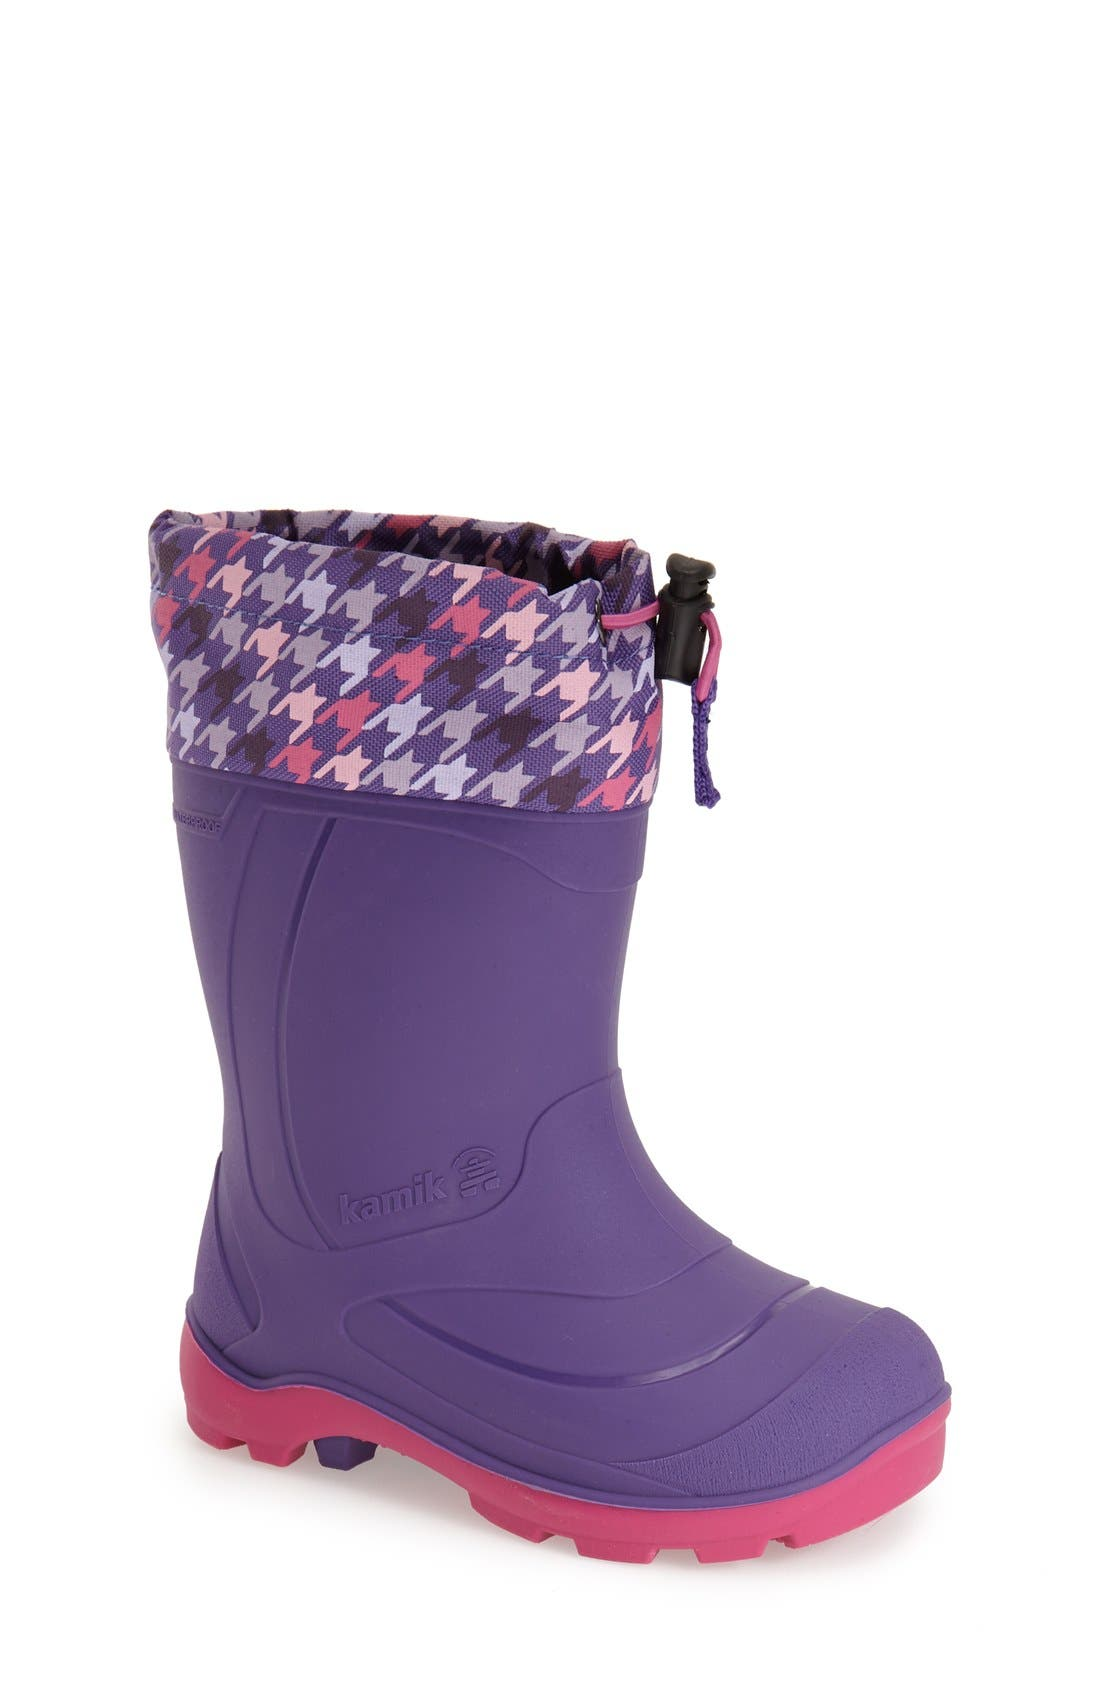 KAMIK 'Snobuster 2' Snow Boot, Main, color, 510